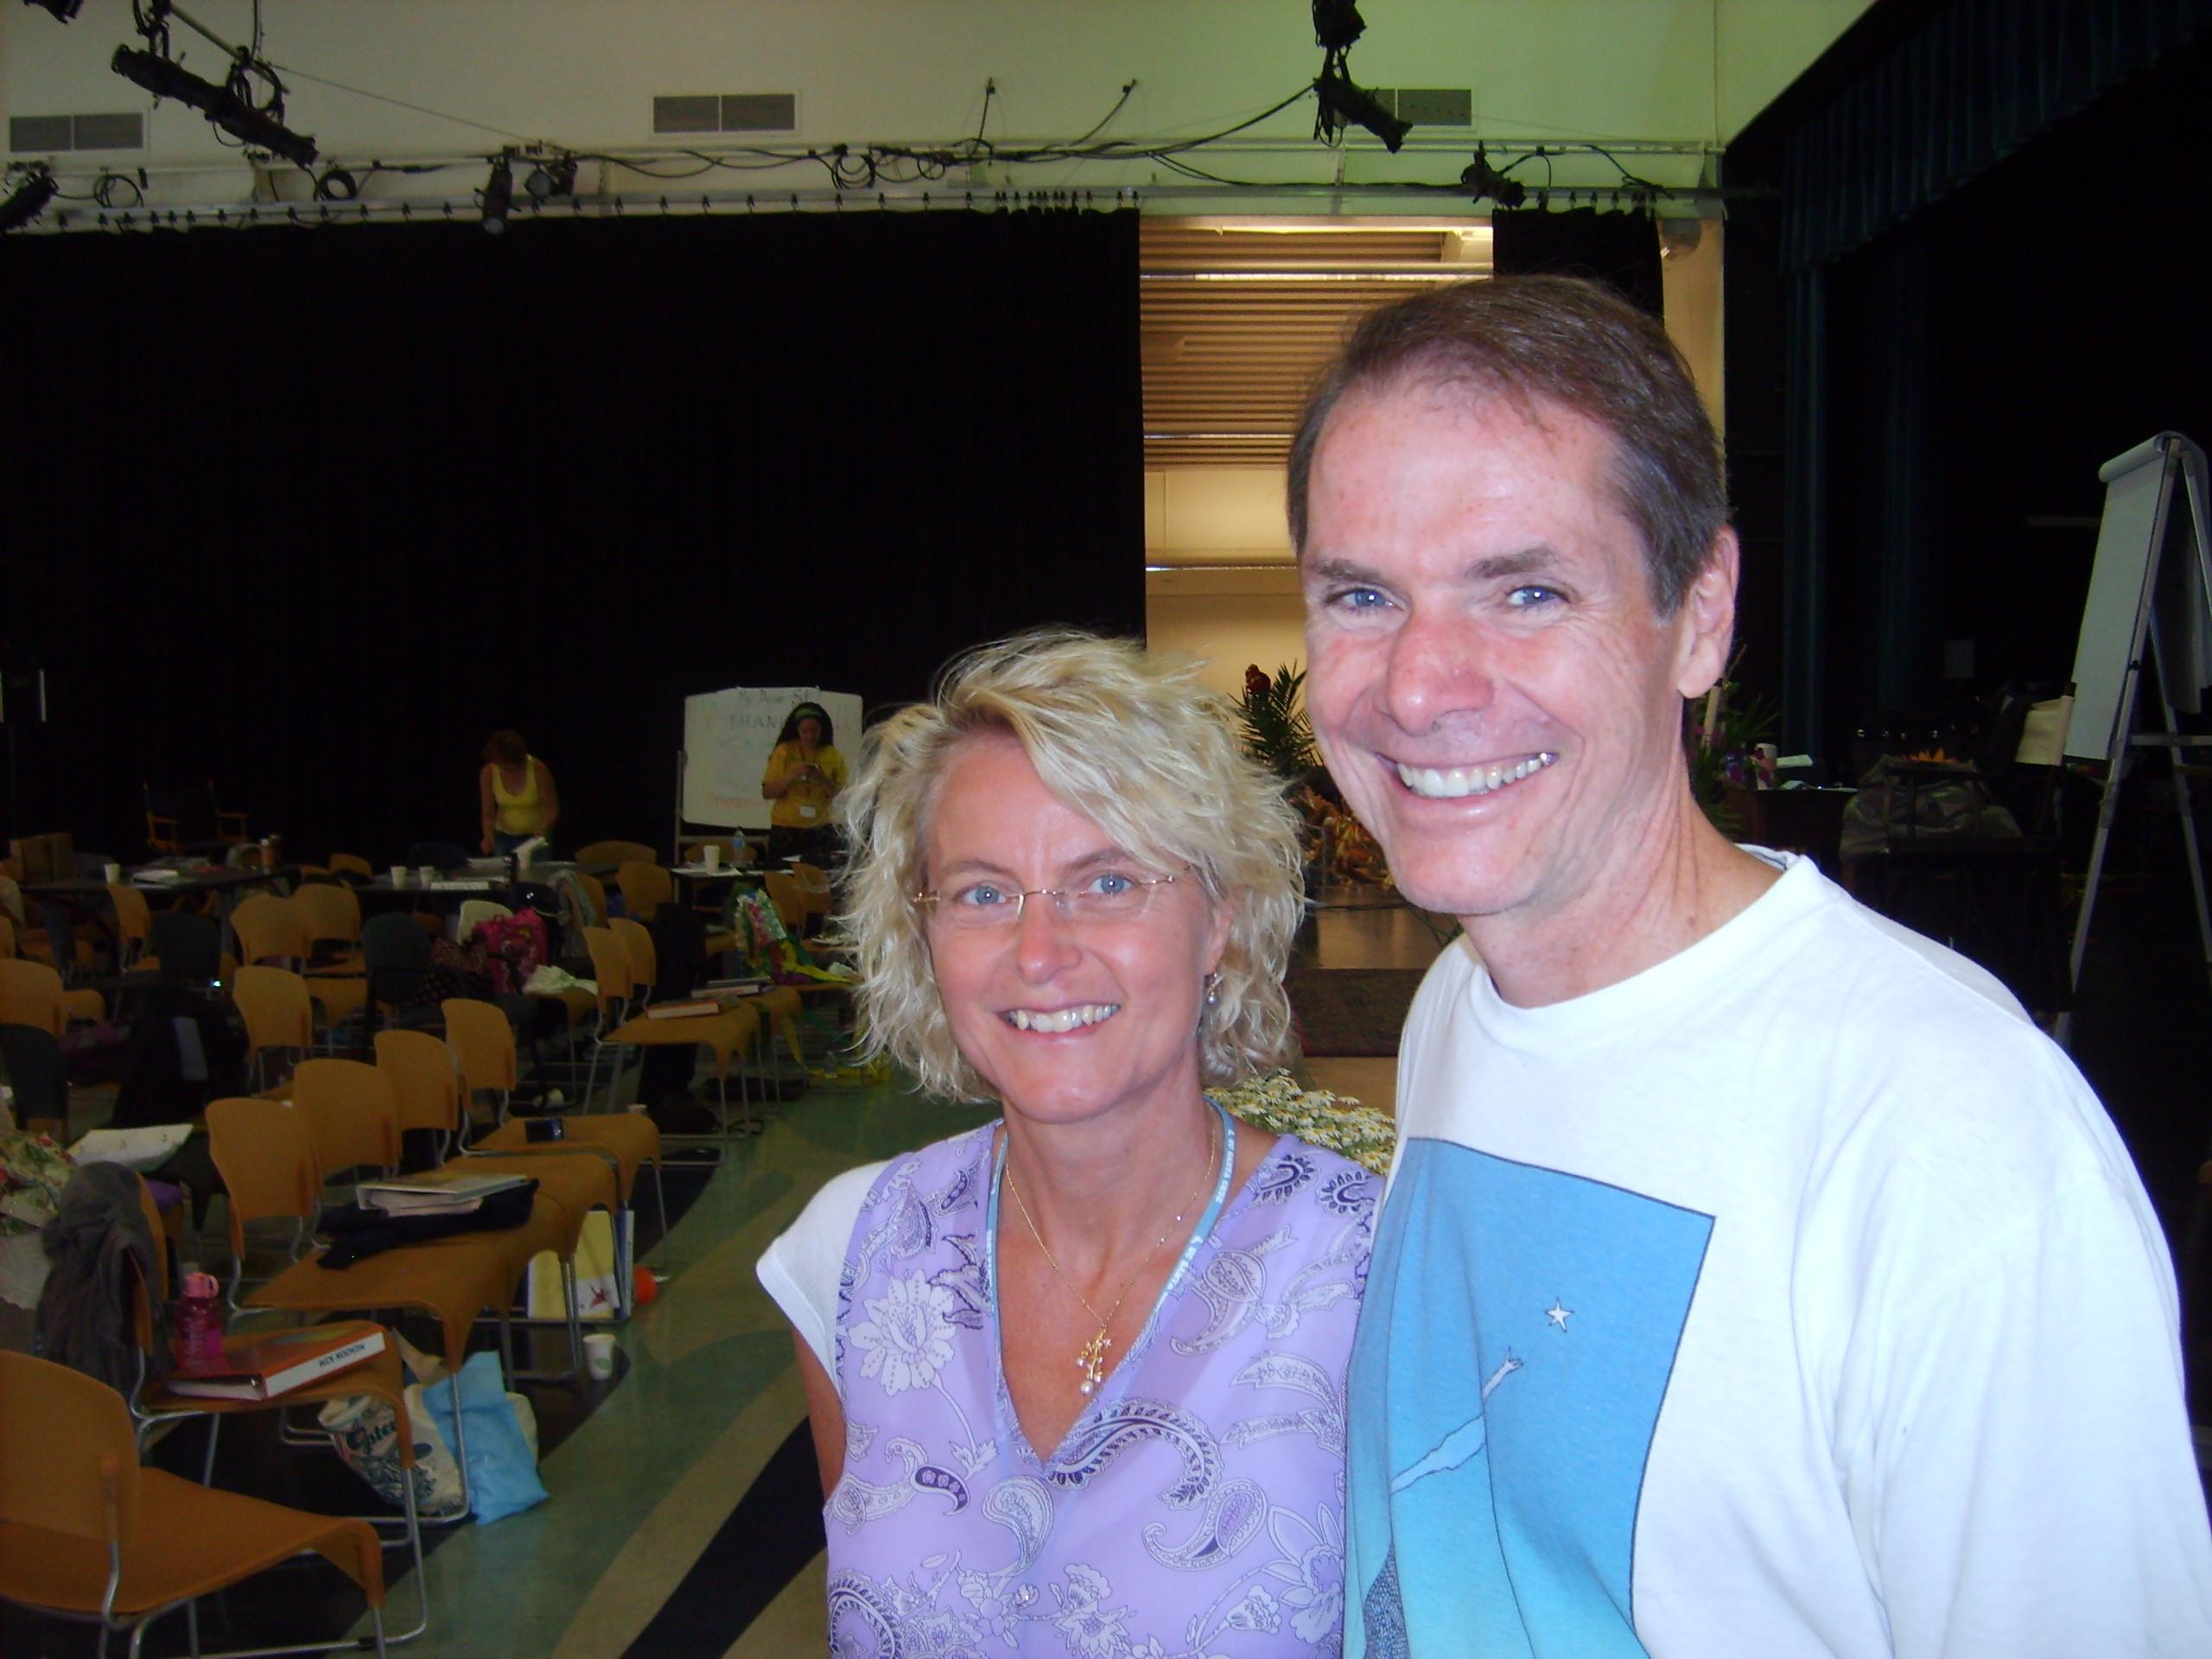 Robert Dilts & Inge, NLPU Santa Cruz